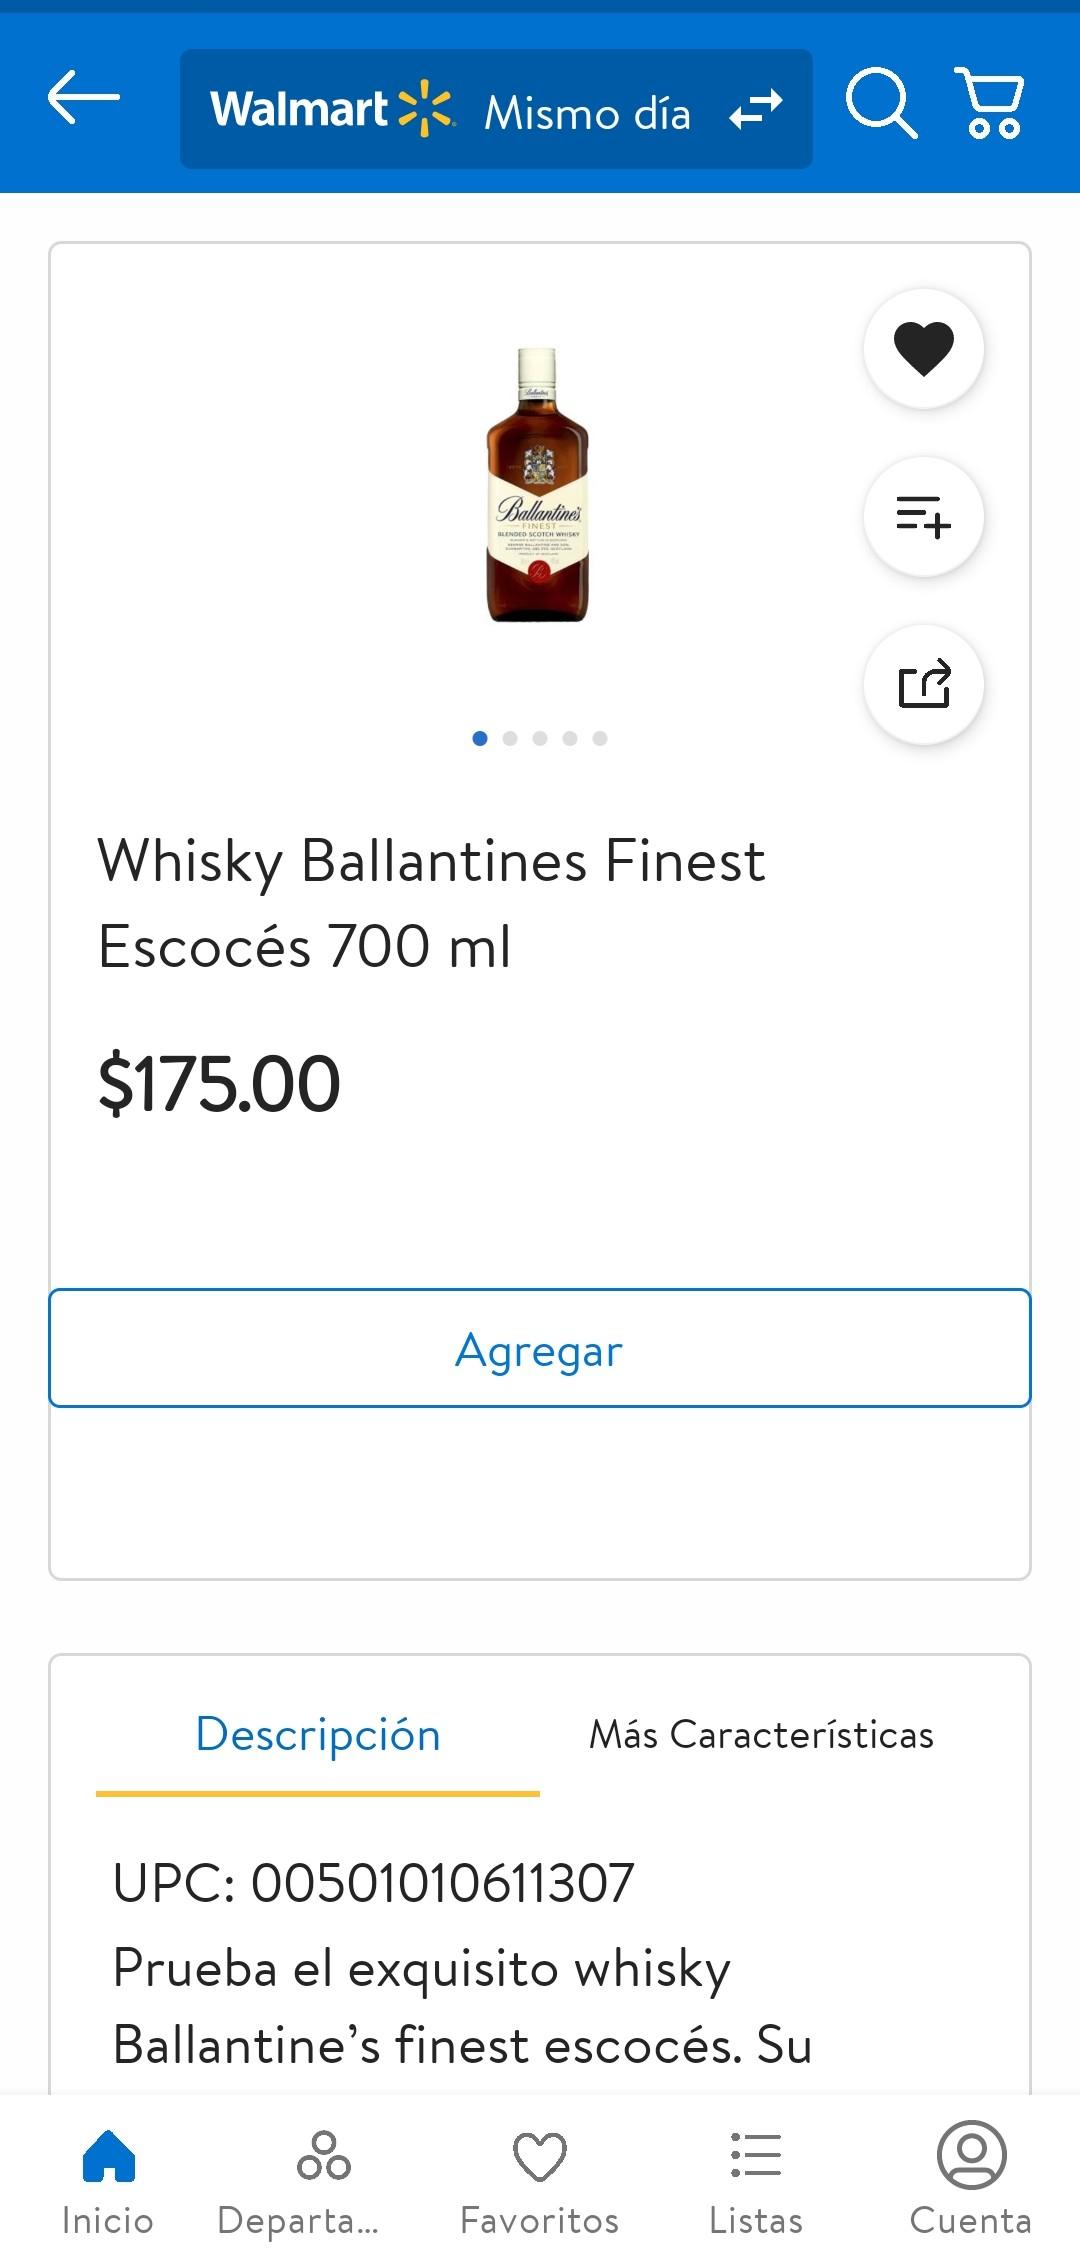 Walmart: Whisky Ballantine's 700 ml